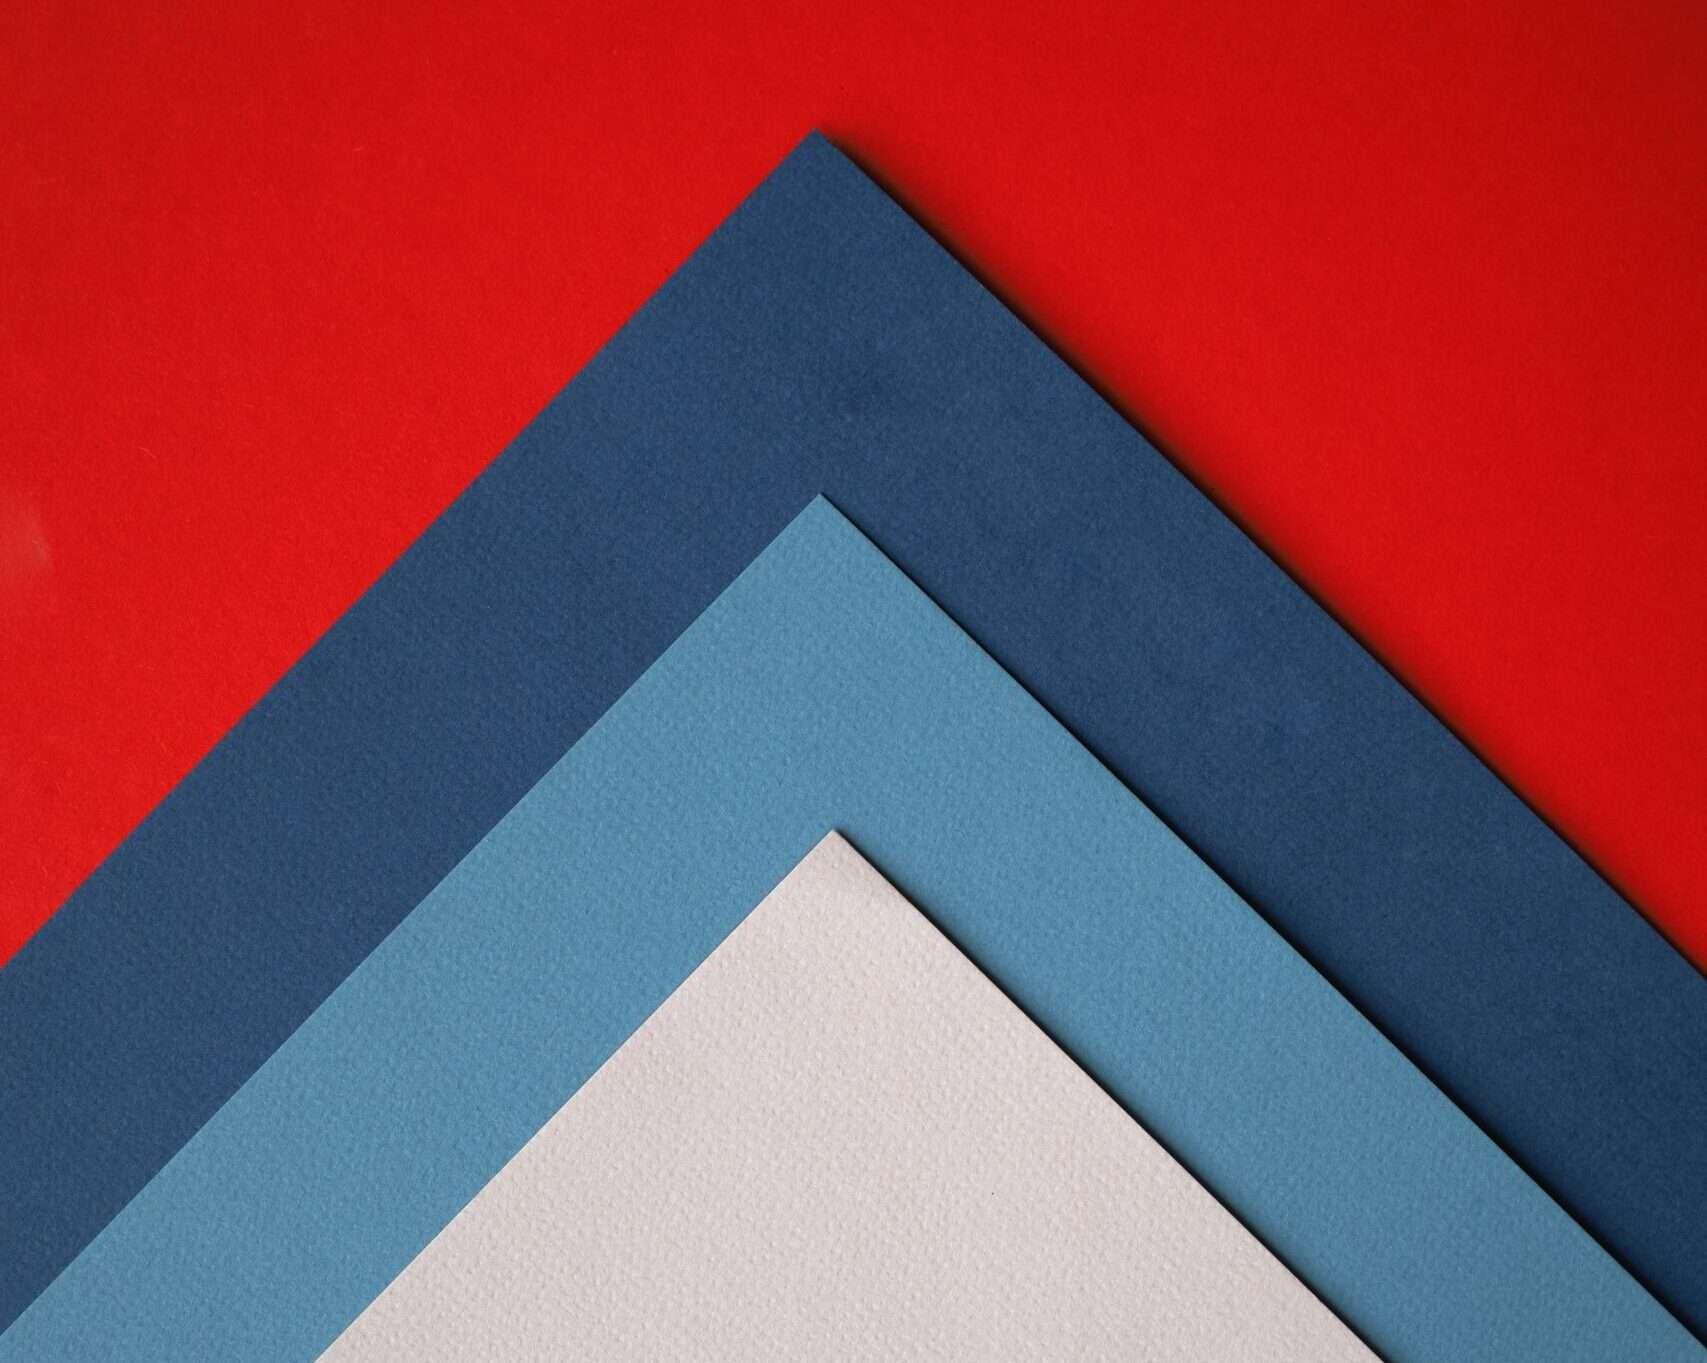 procreate paper texture free